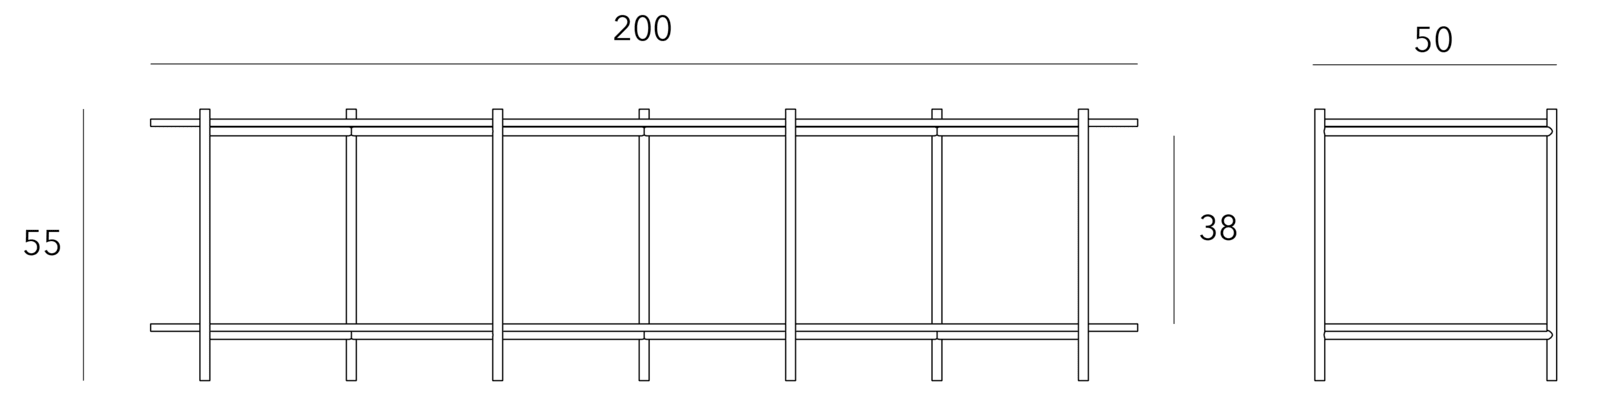 specifications - Cross Shelving Unit Low - Black